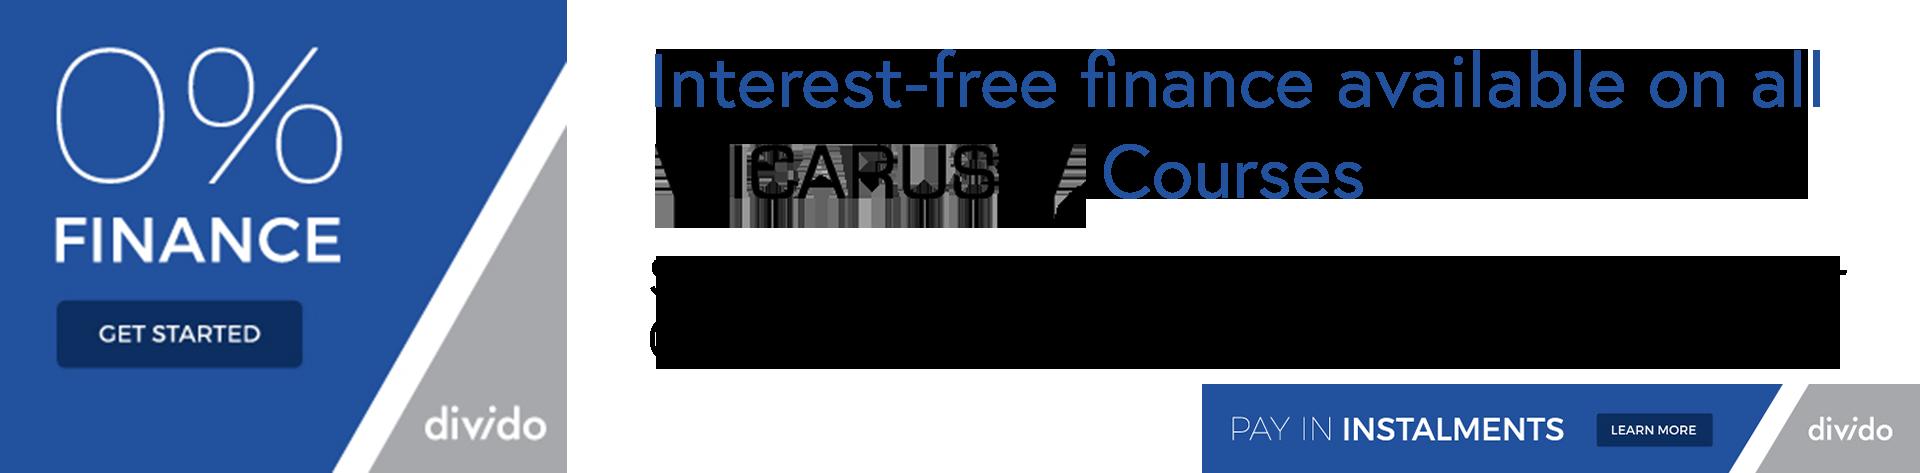 drone-course-finance